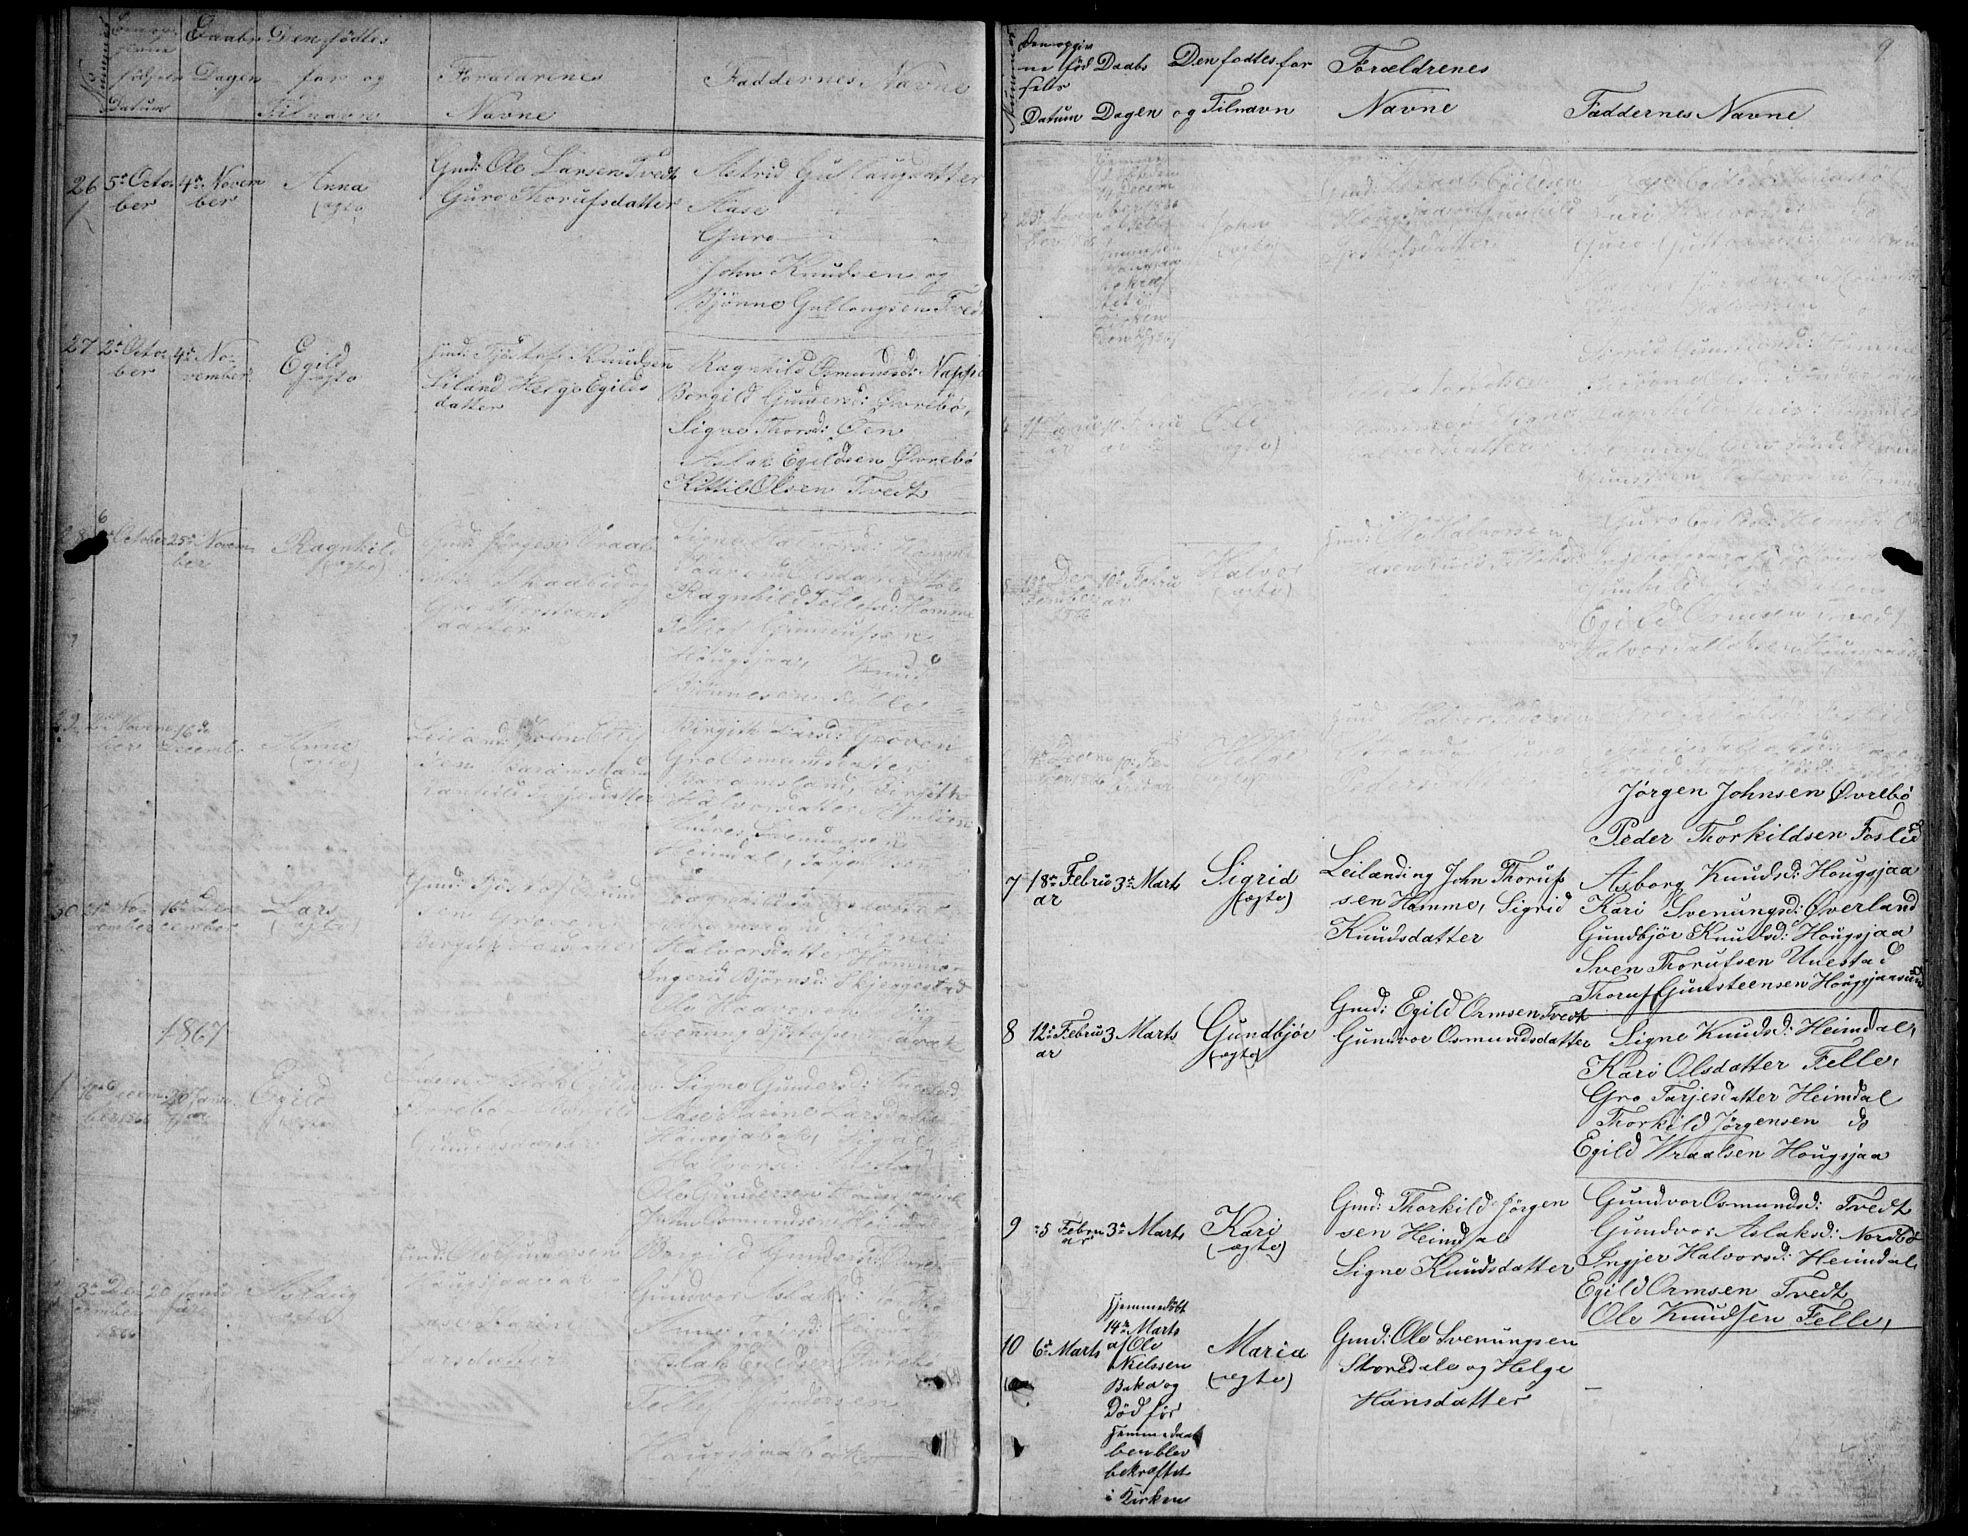 SAKO, Nissedal kirkebøker, G/Gb/L0002: Klokkerbok nr. II 2, 1863-1892, s. 9